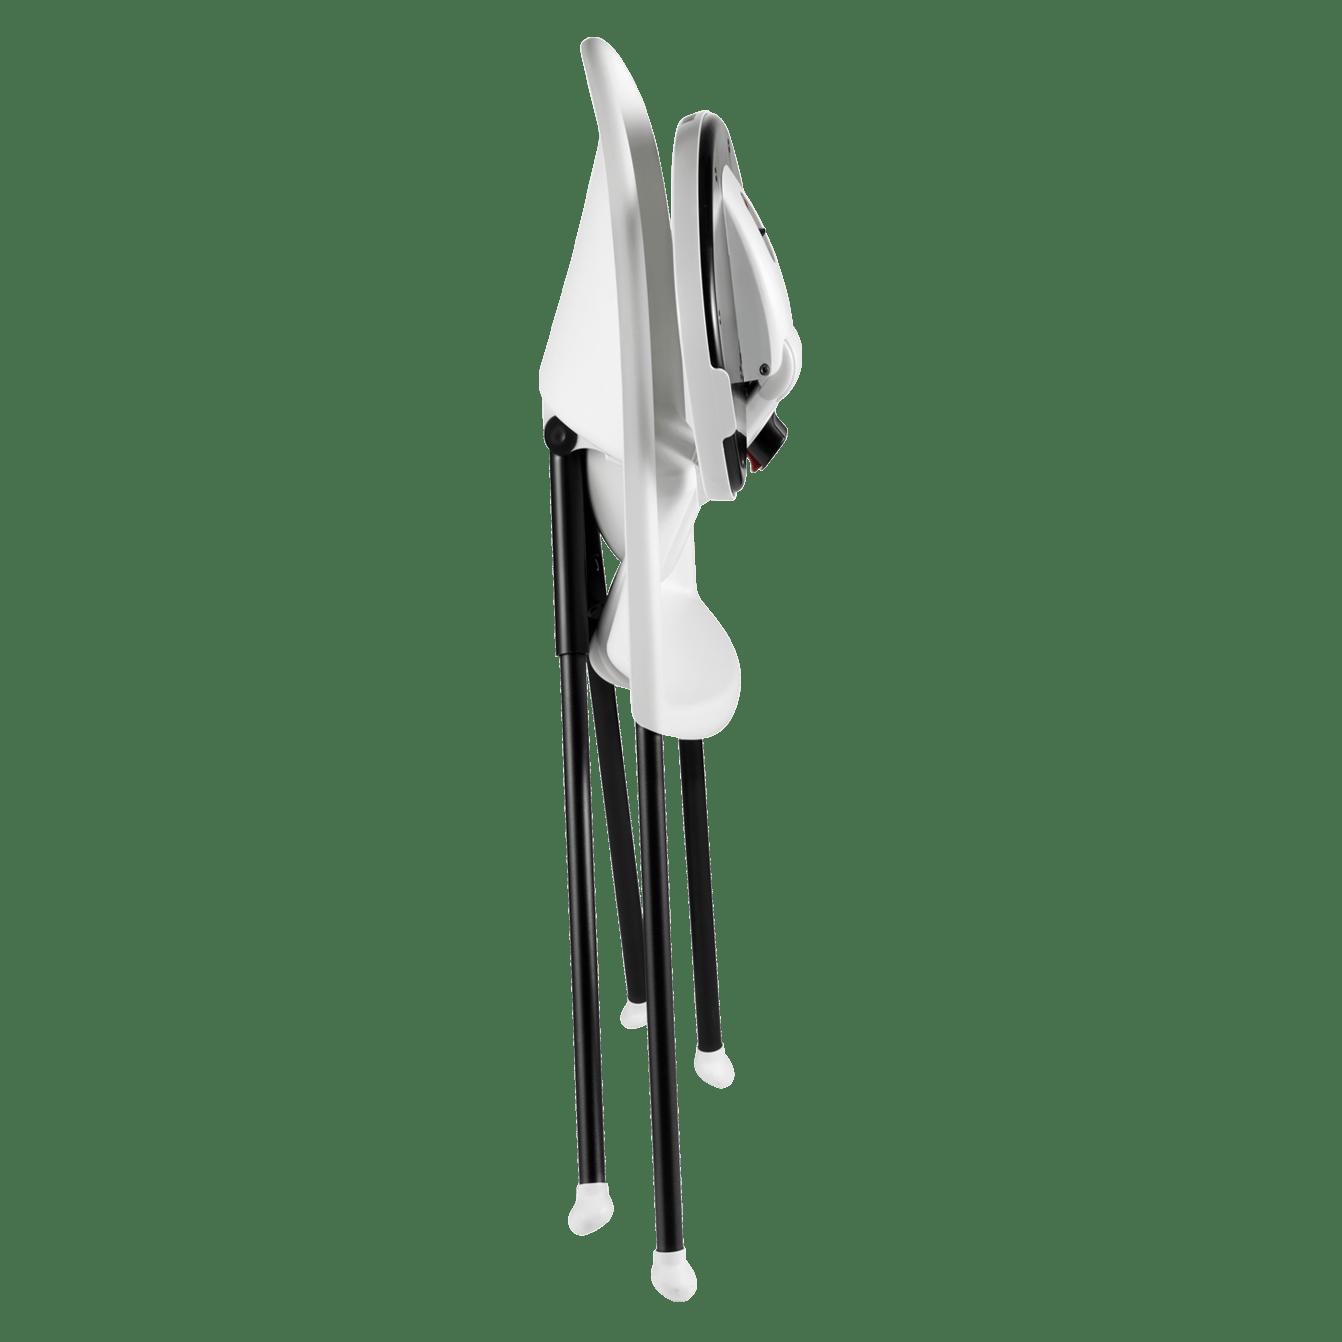 high-chair-white-067021-babybjorn-folded